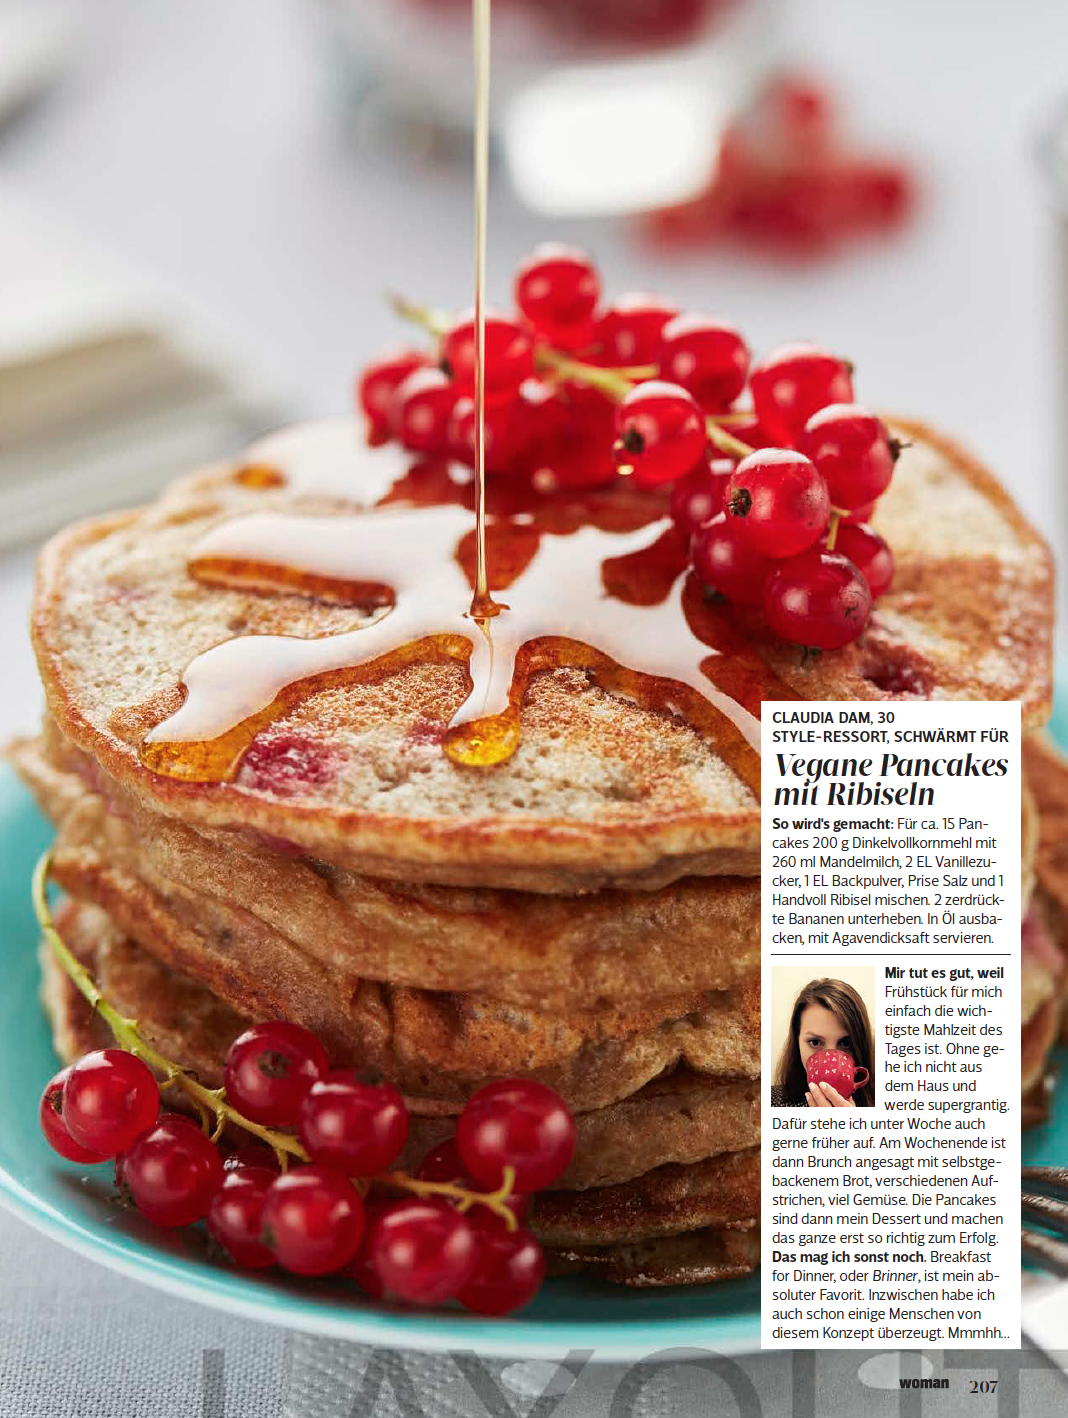 Pancakes fürs Food Styling Portfolio